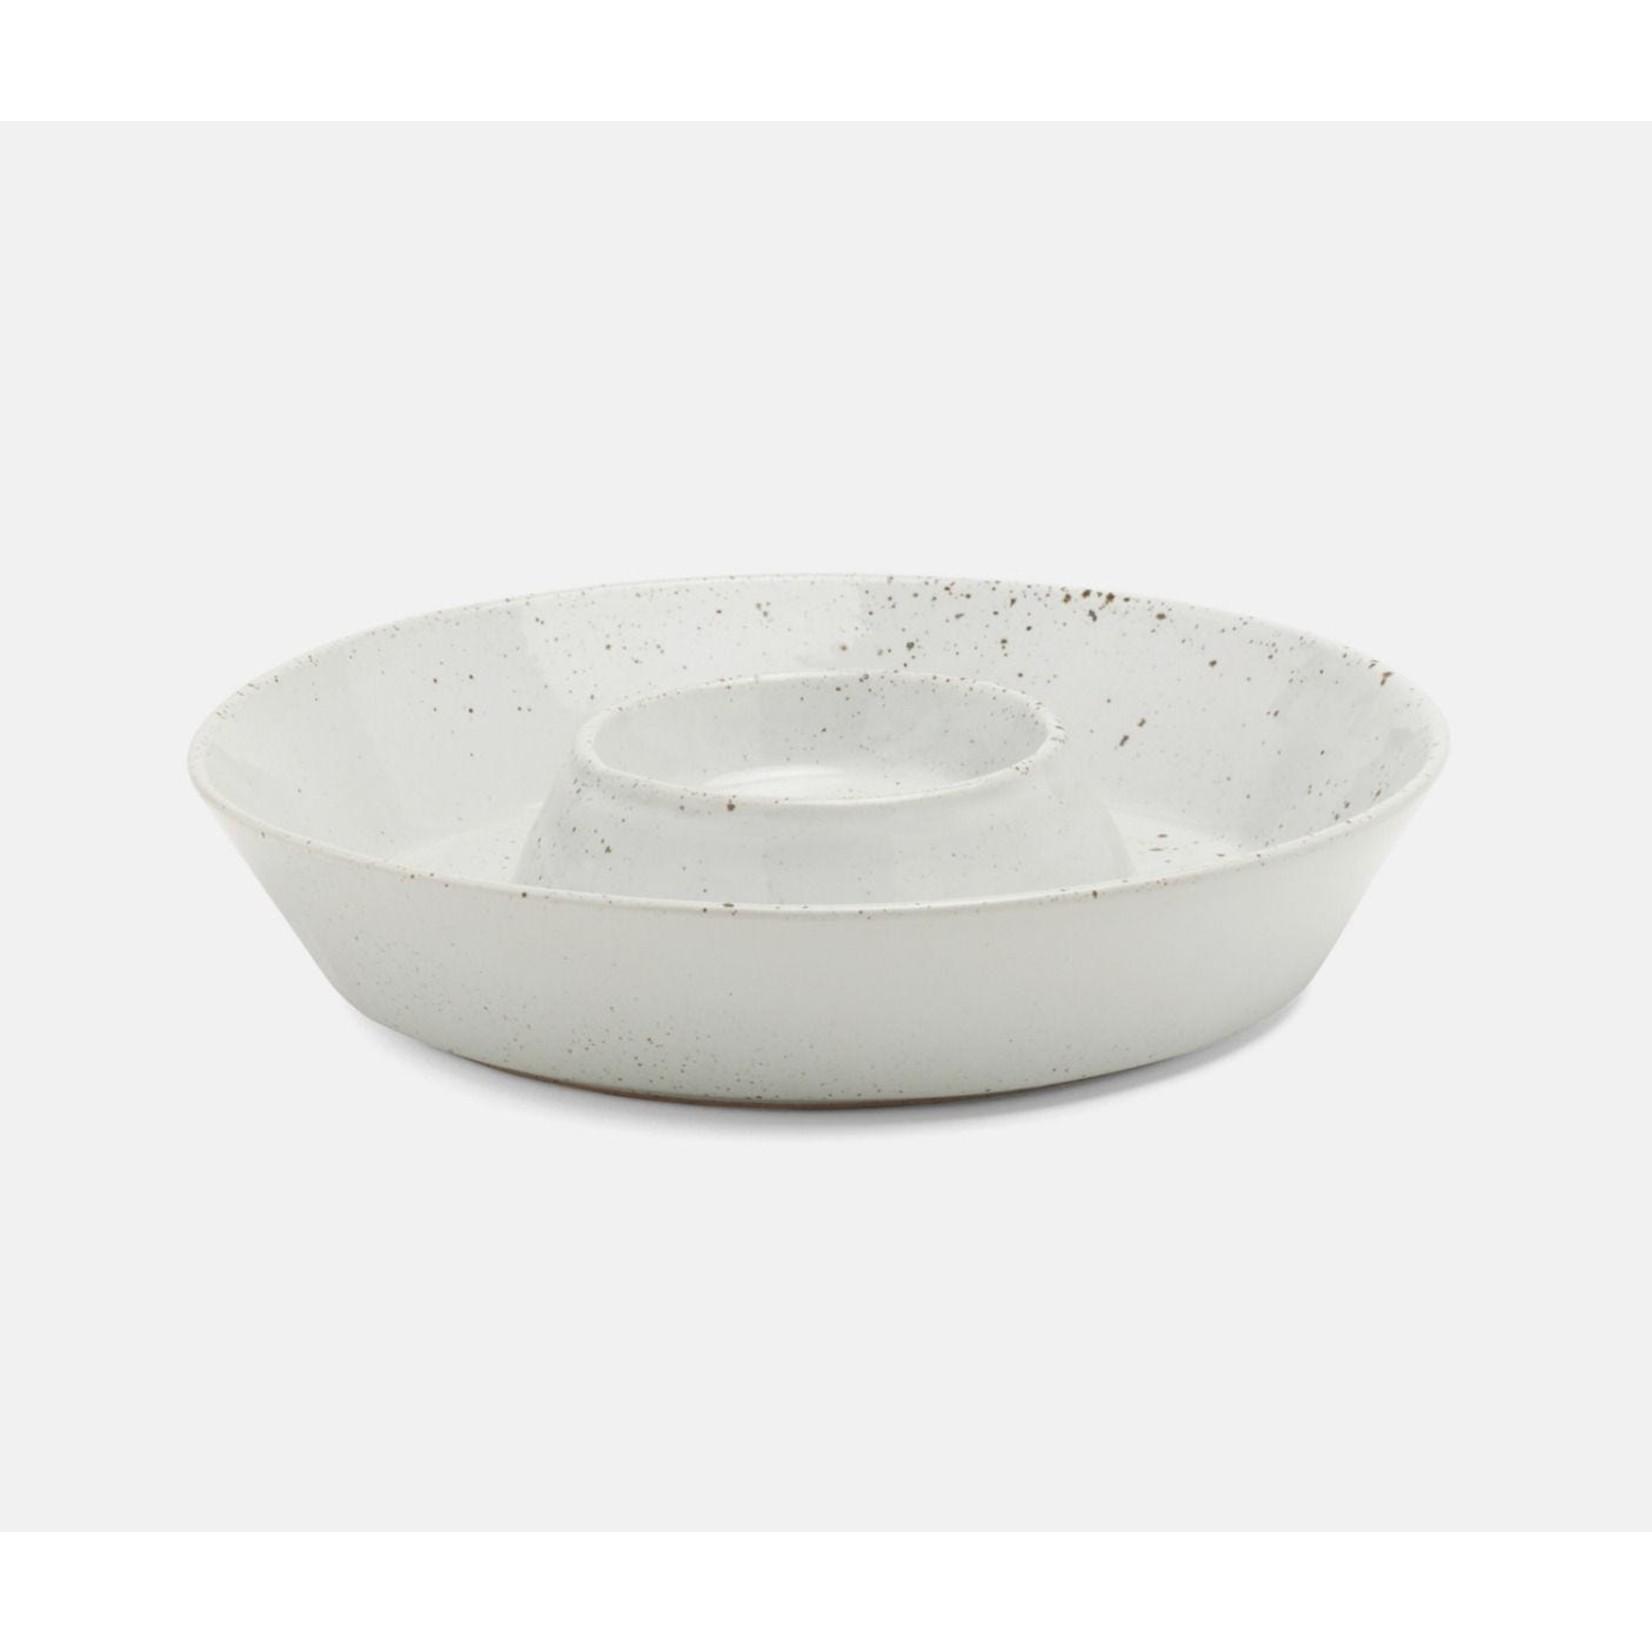 Blue Pheasant Marcus Chip and Dip Bowl -  White Salt Glaze